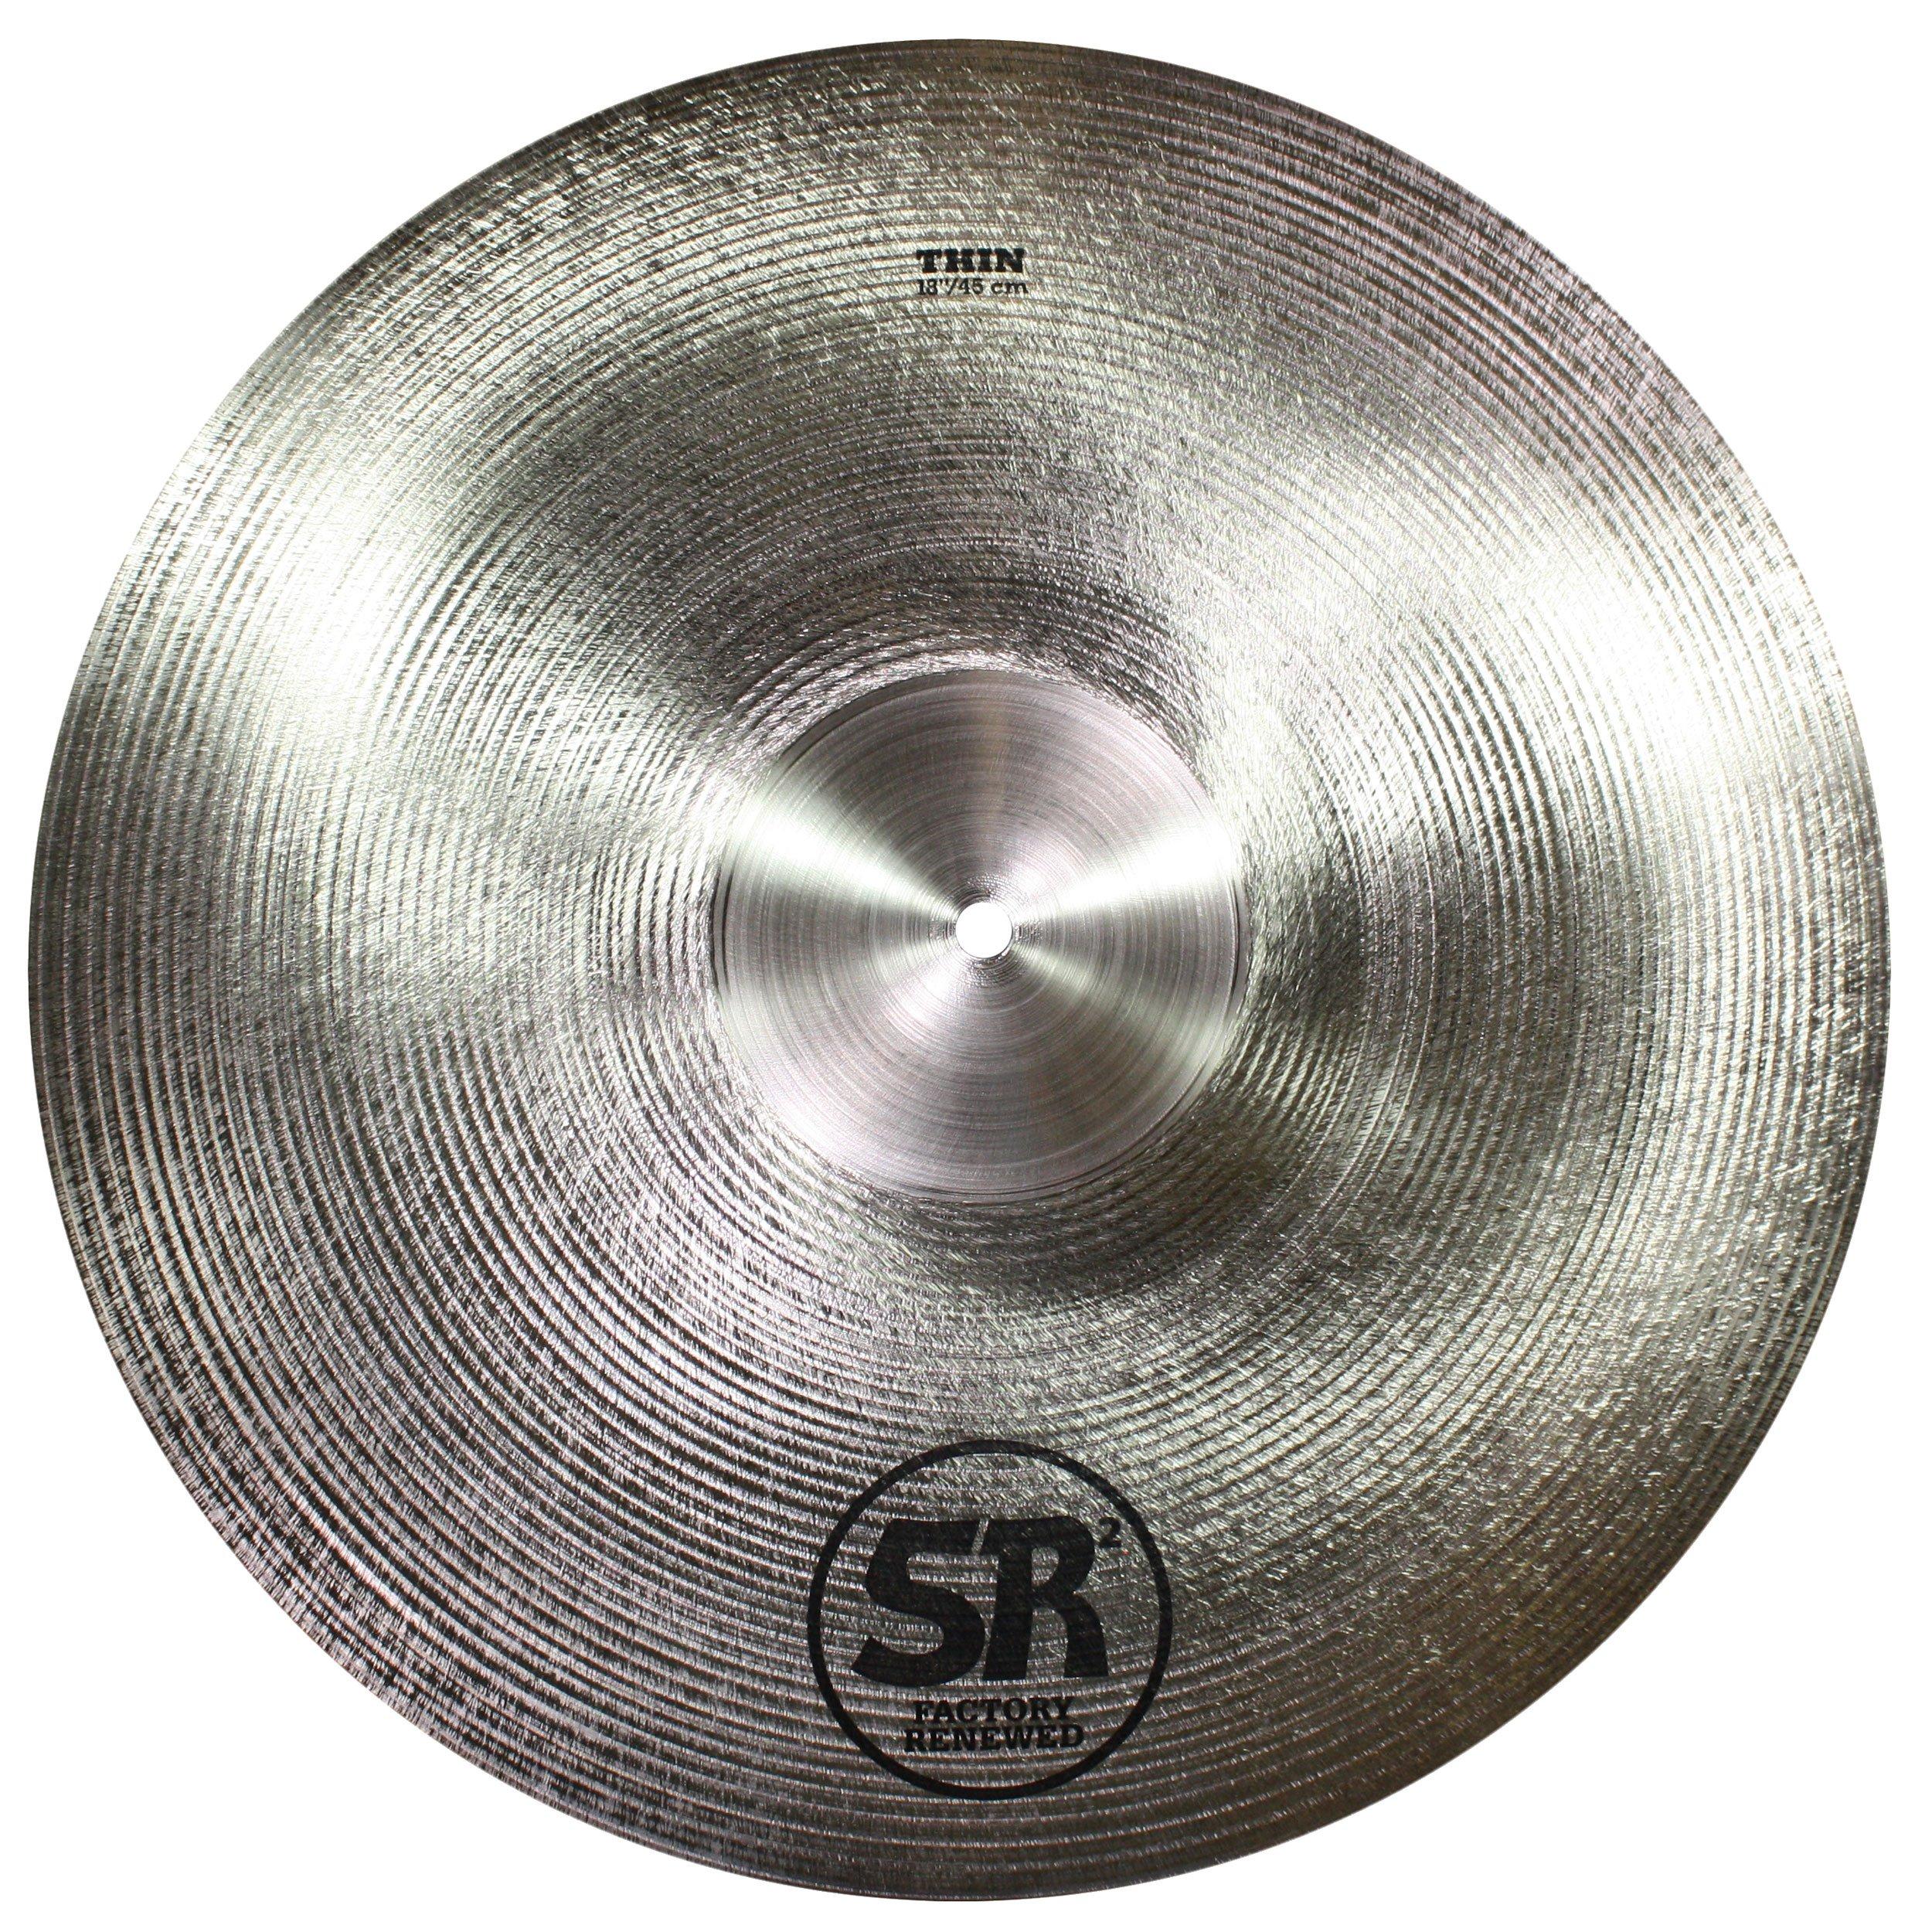 Sabian SR2 Factory Refreshed B20 Bronze Cast Cymbal - 18'' Thin, Crash/Ride